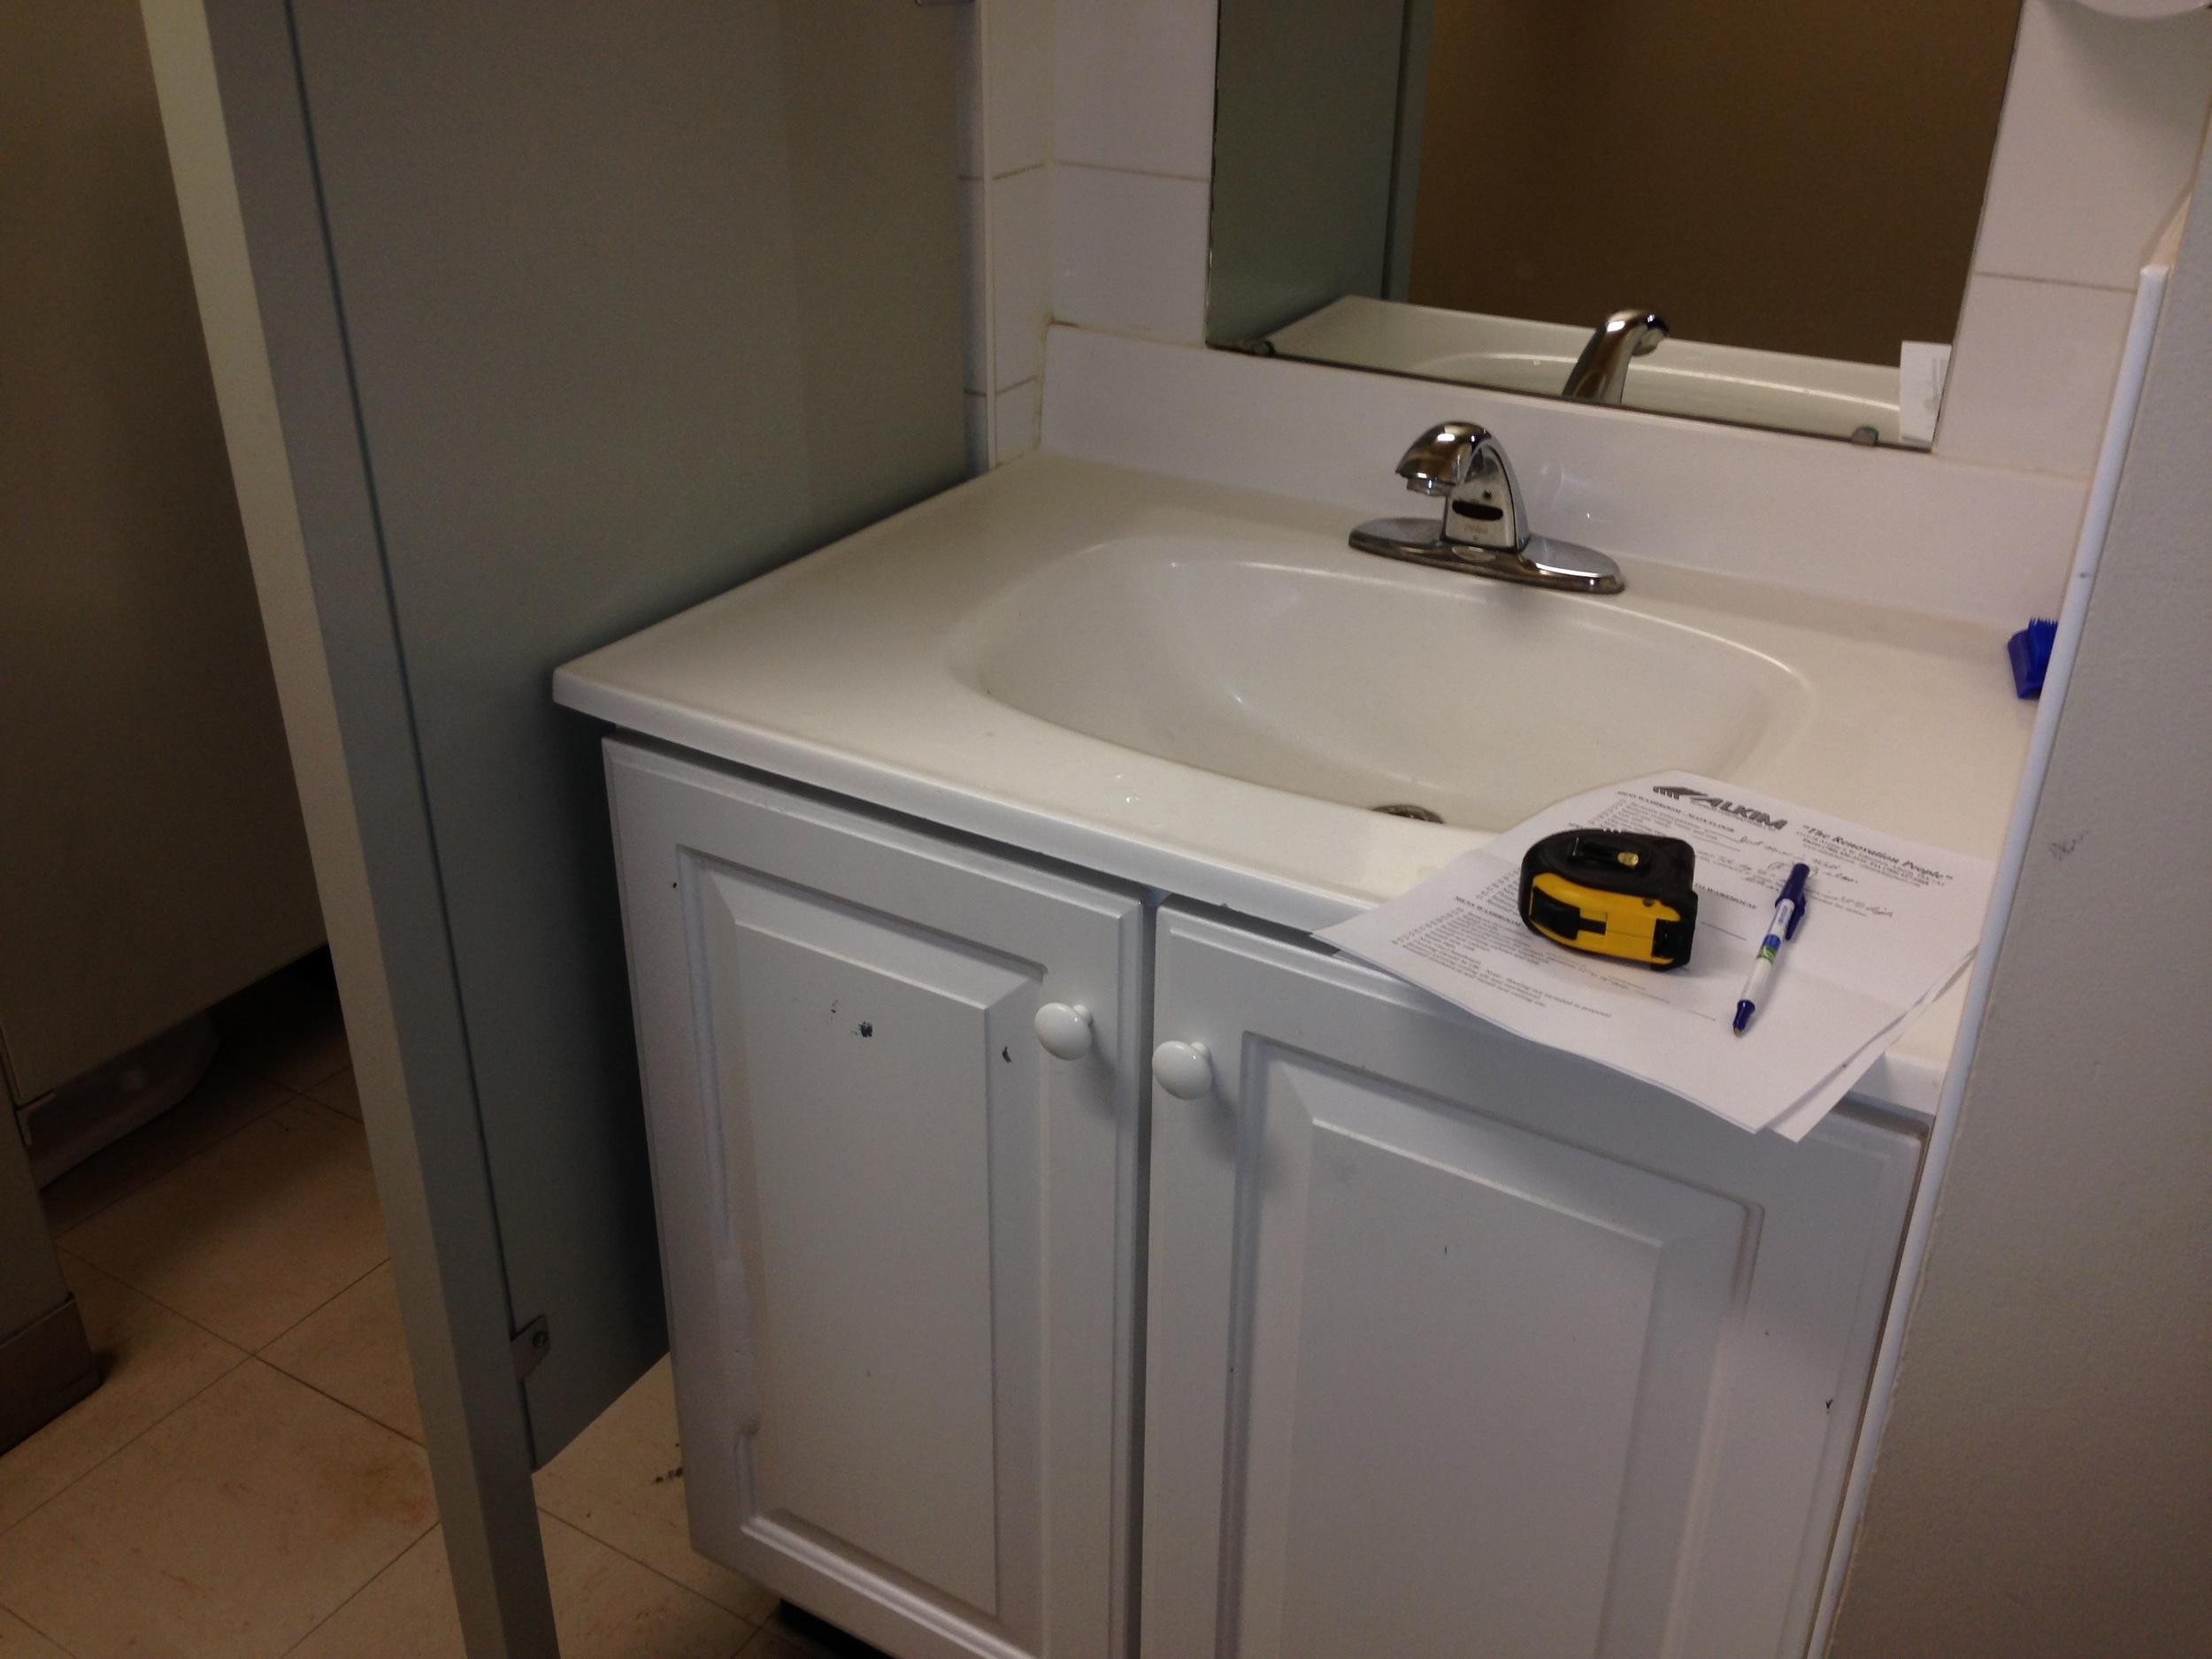 PB08  Plumbing - General Contractors Commercial Renovations in Edmonton, Office and Warehouse Project Contractors